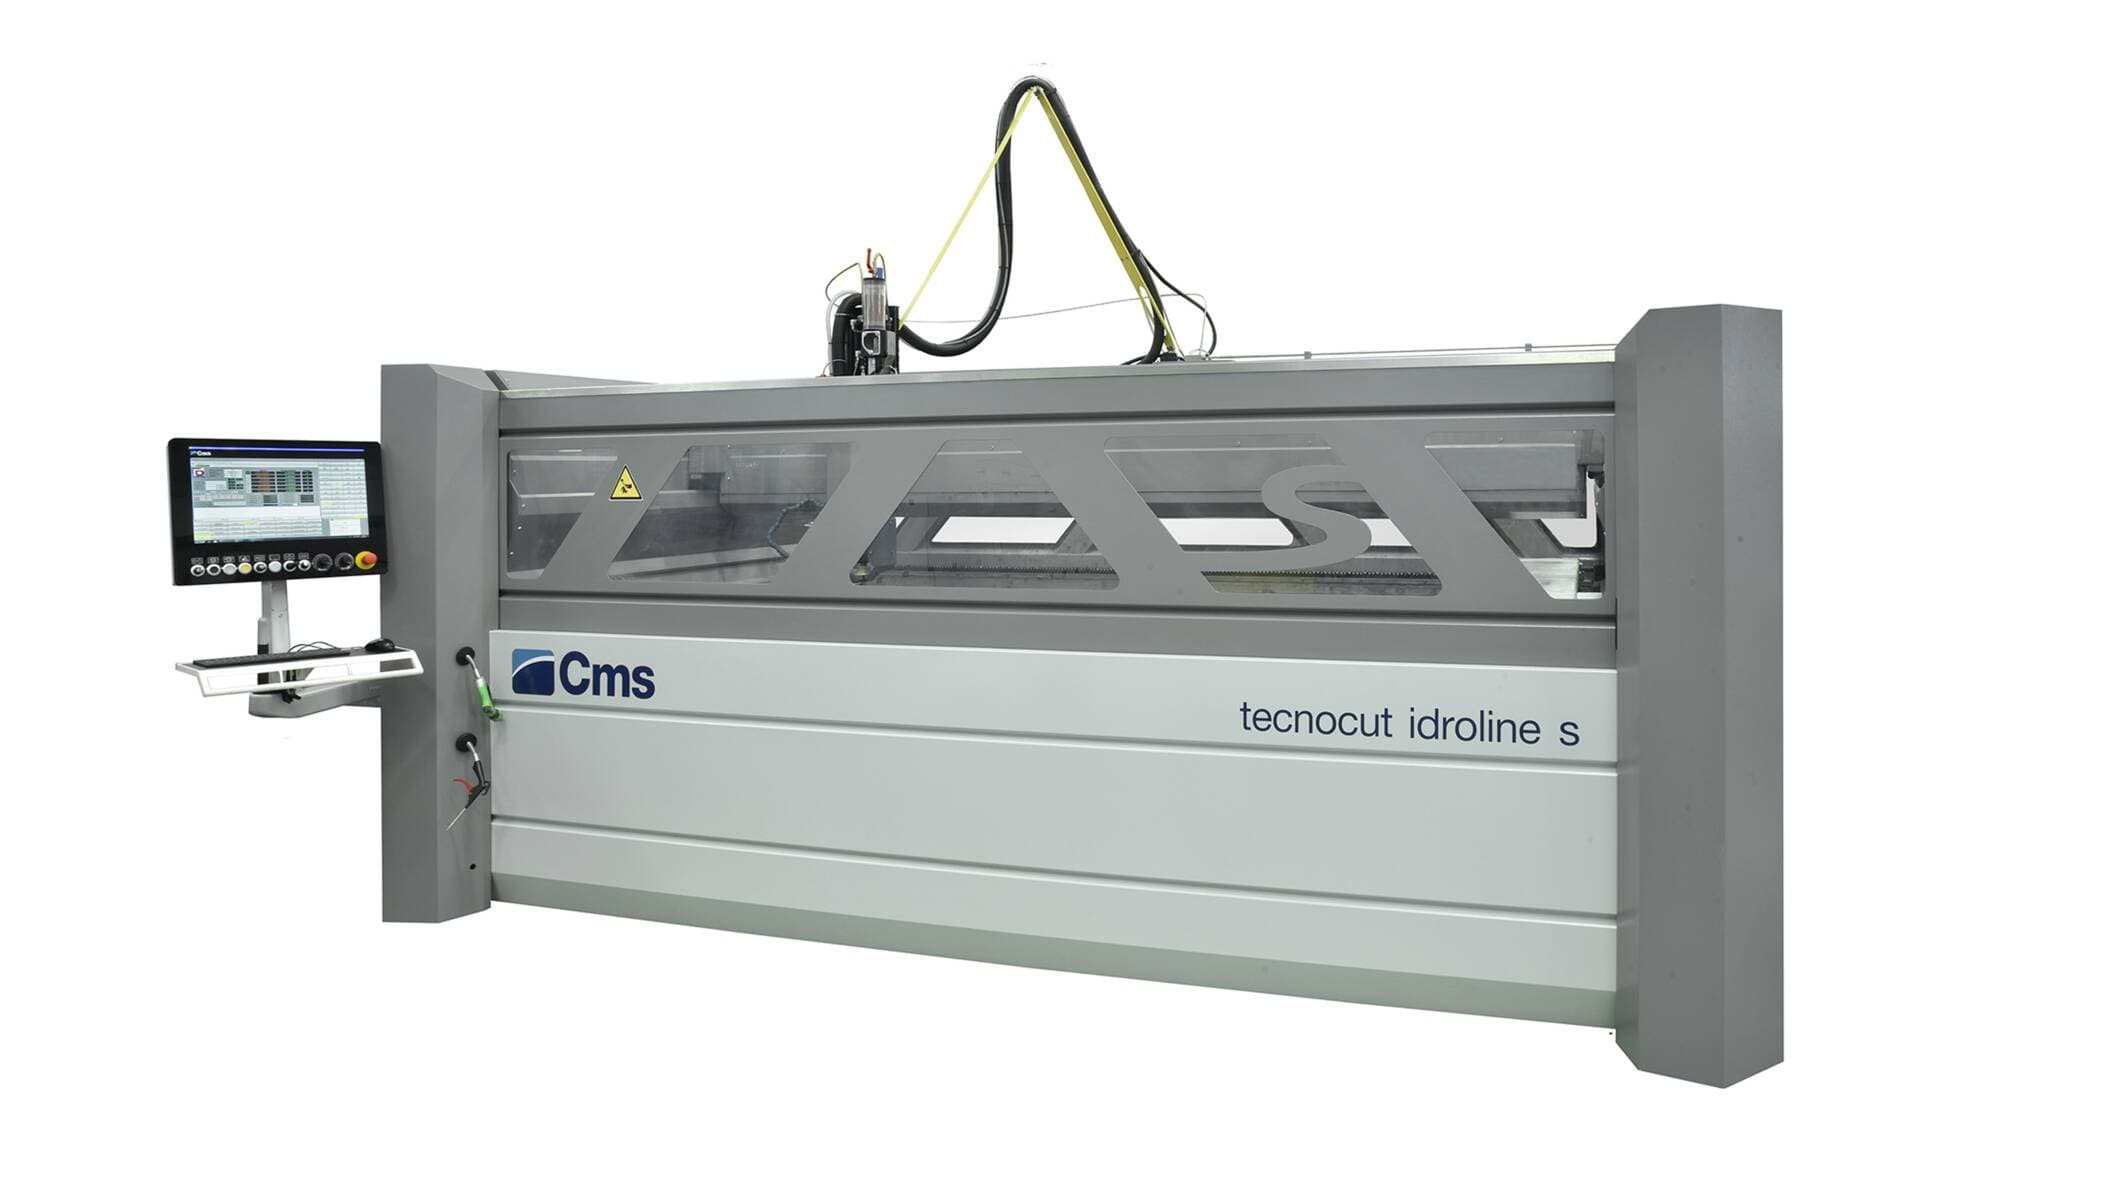 Tecnocut Idroline S - hydro-abrasive Waterjet Cutting System